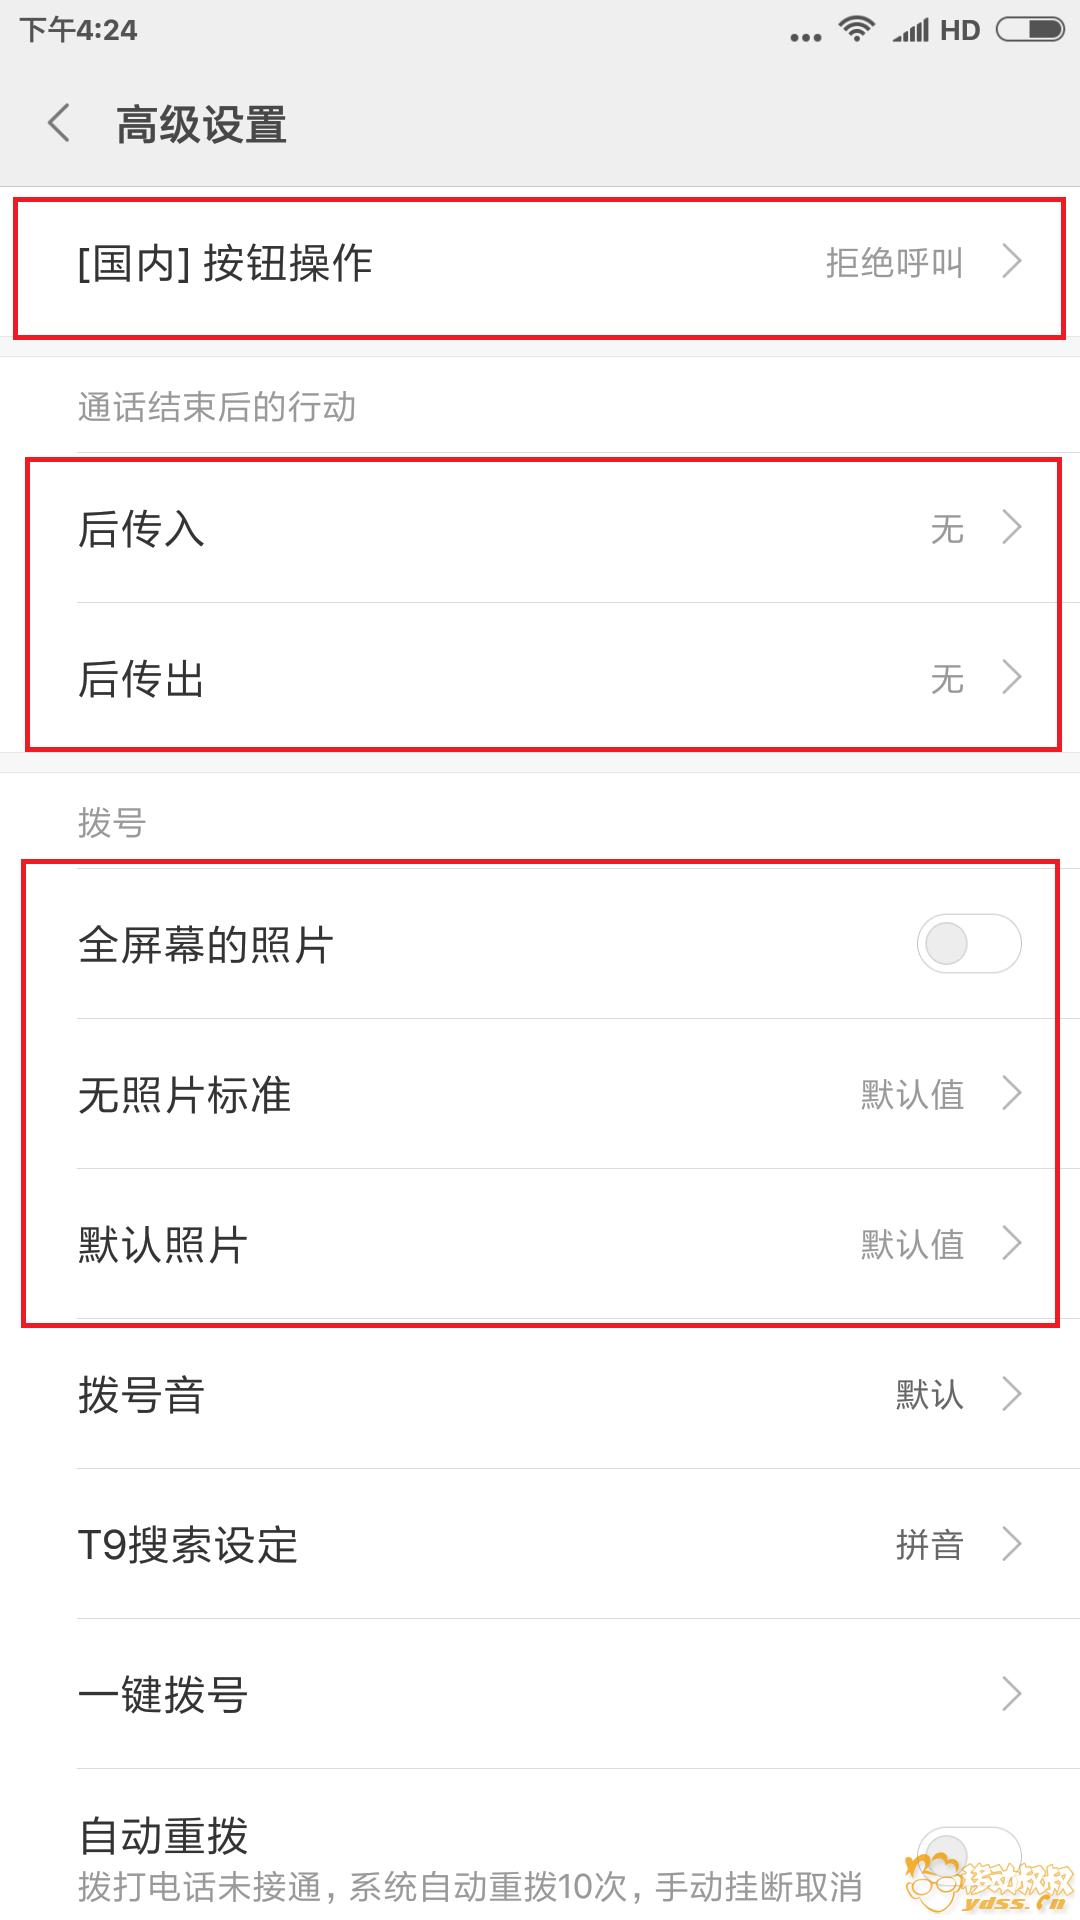 Screenshot_2018-05-19-16-24-52-254_com.android.phone.png